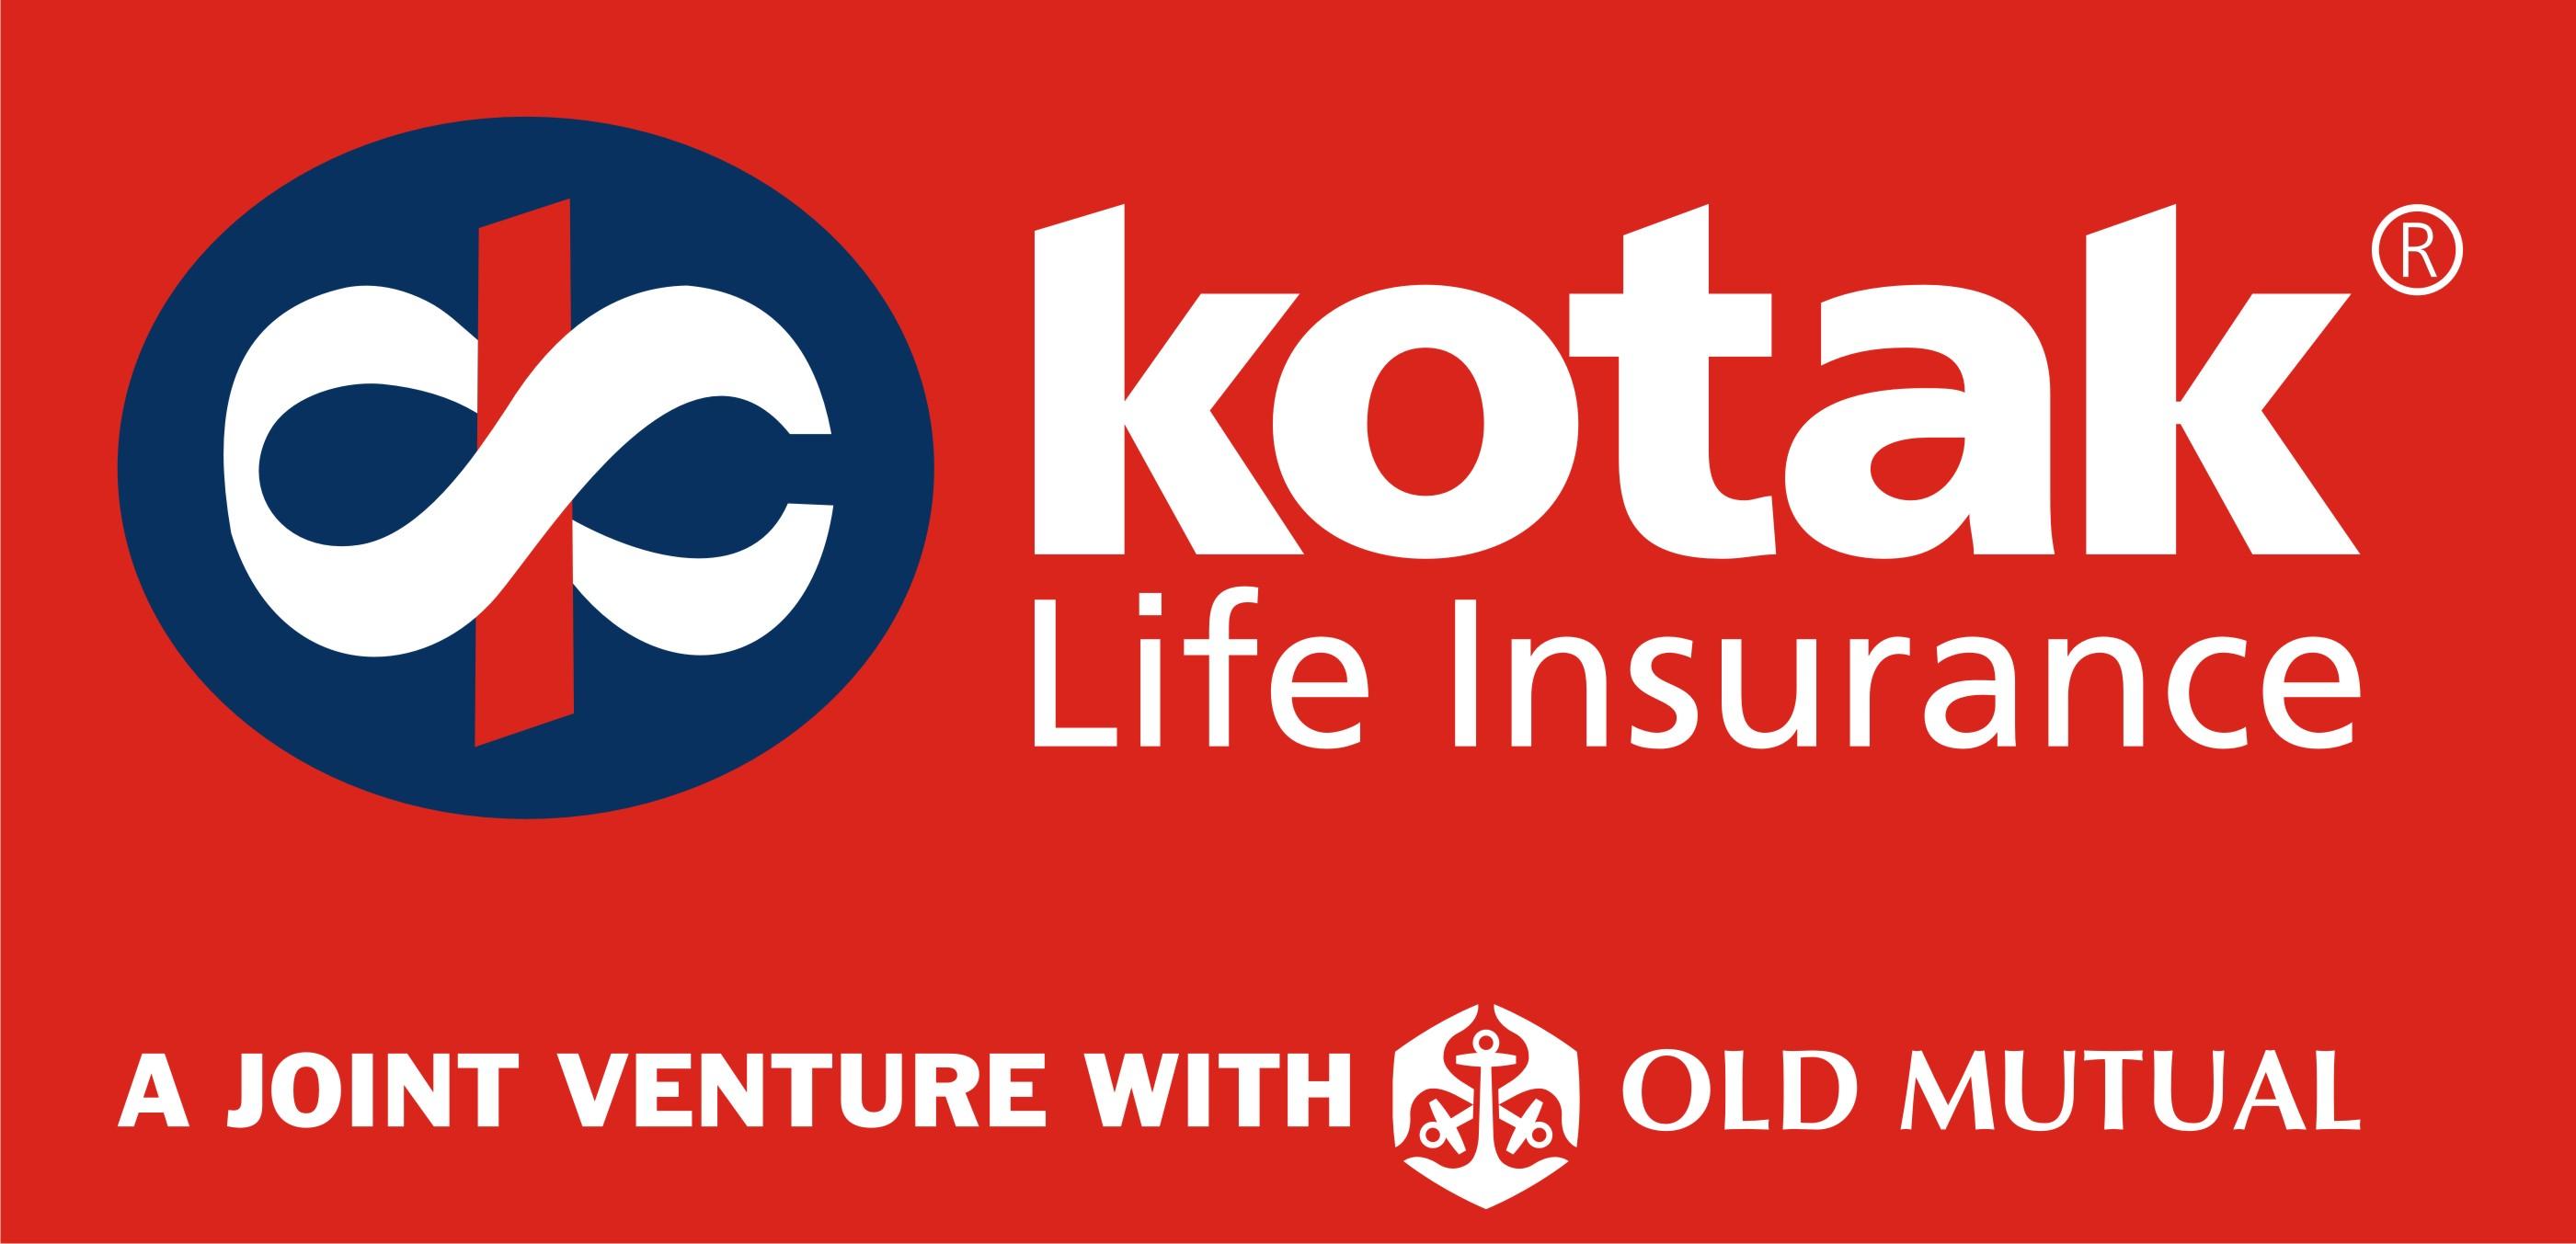 Kotak Mahindra Life Insurance Image